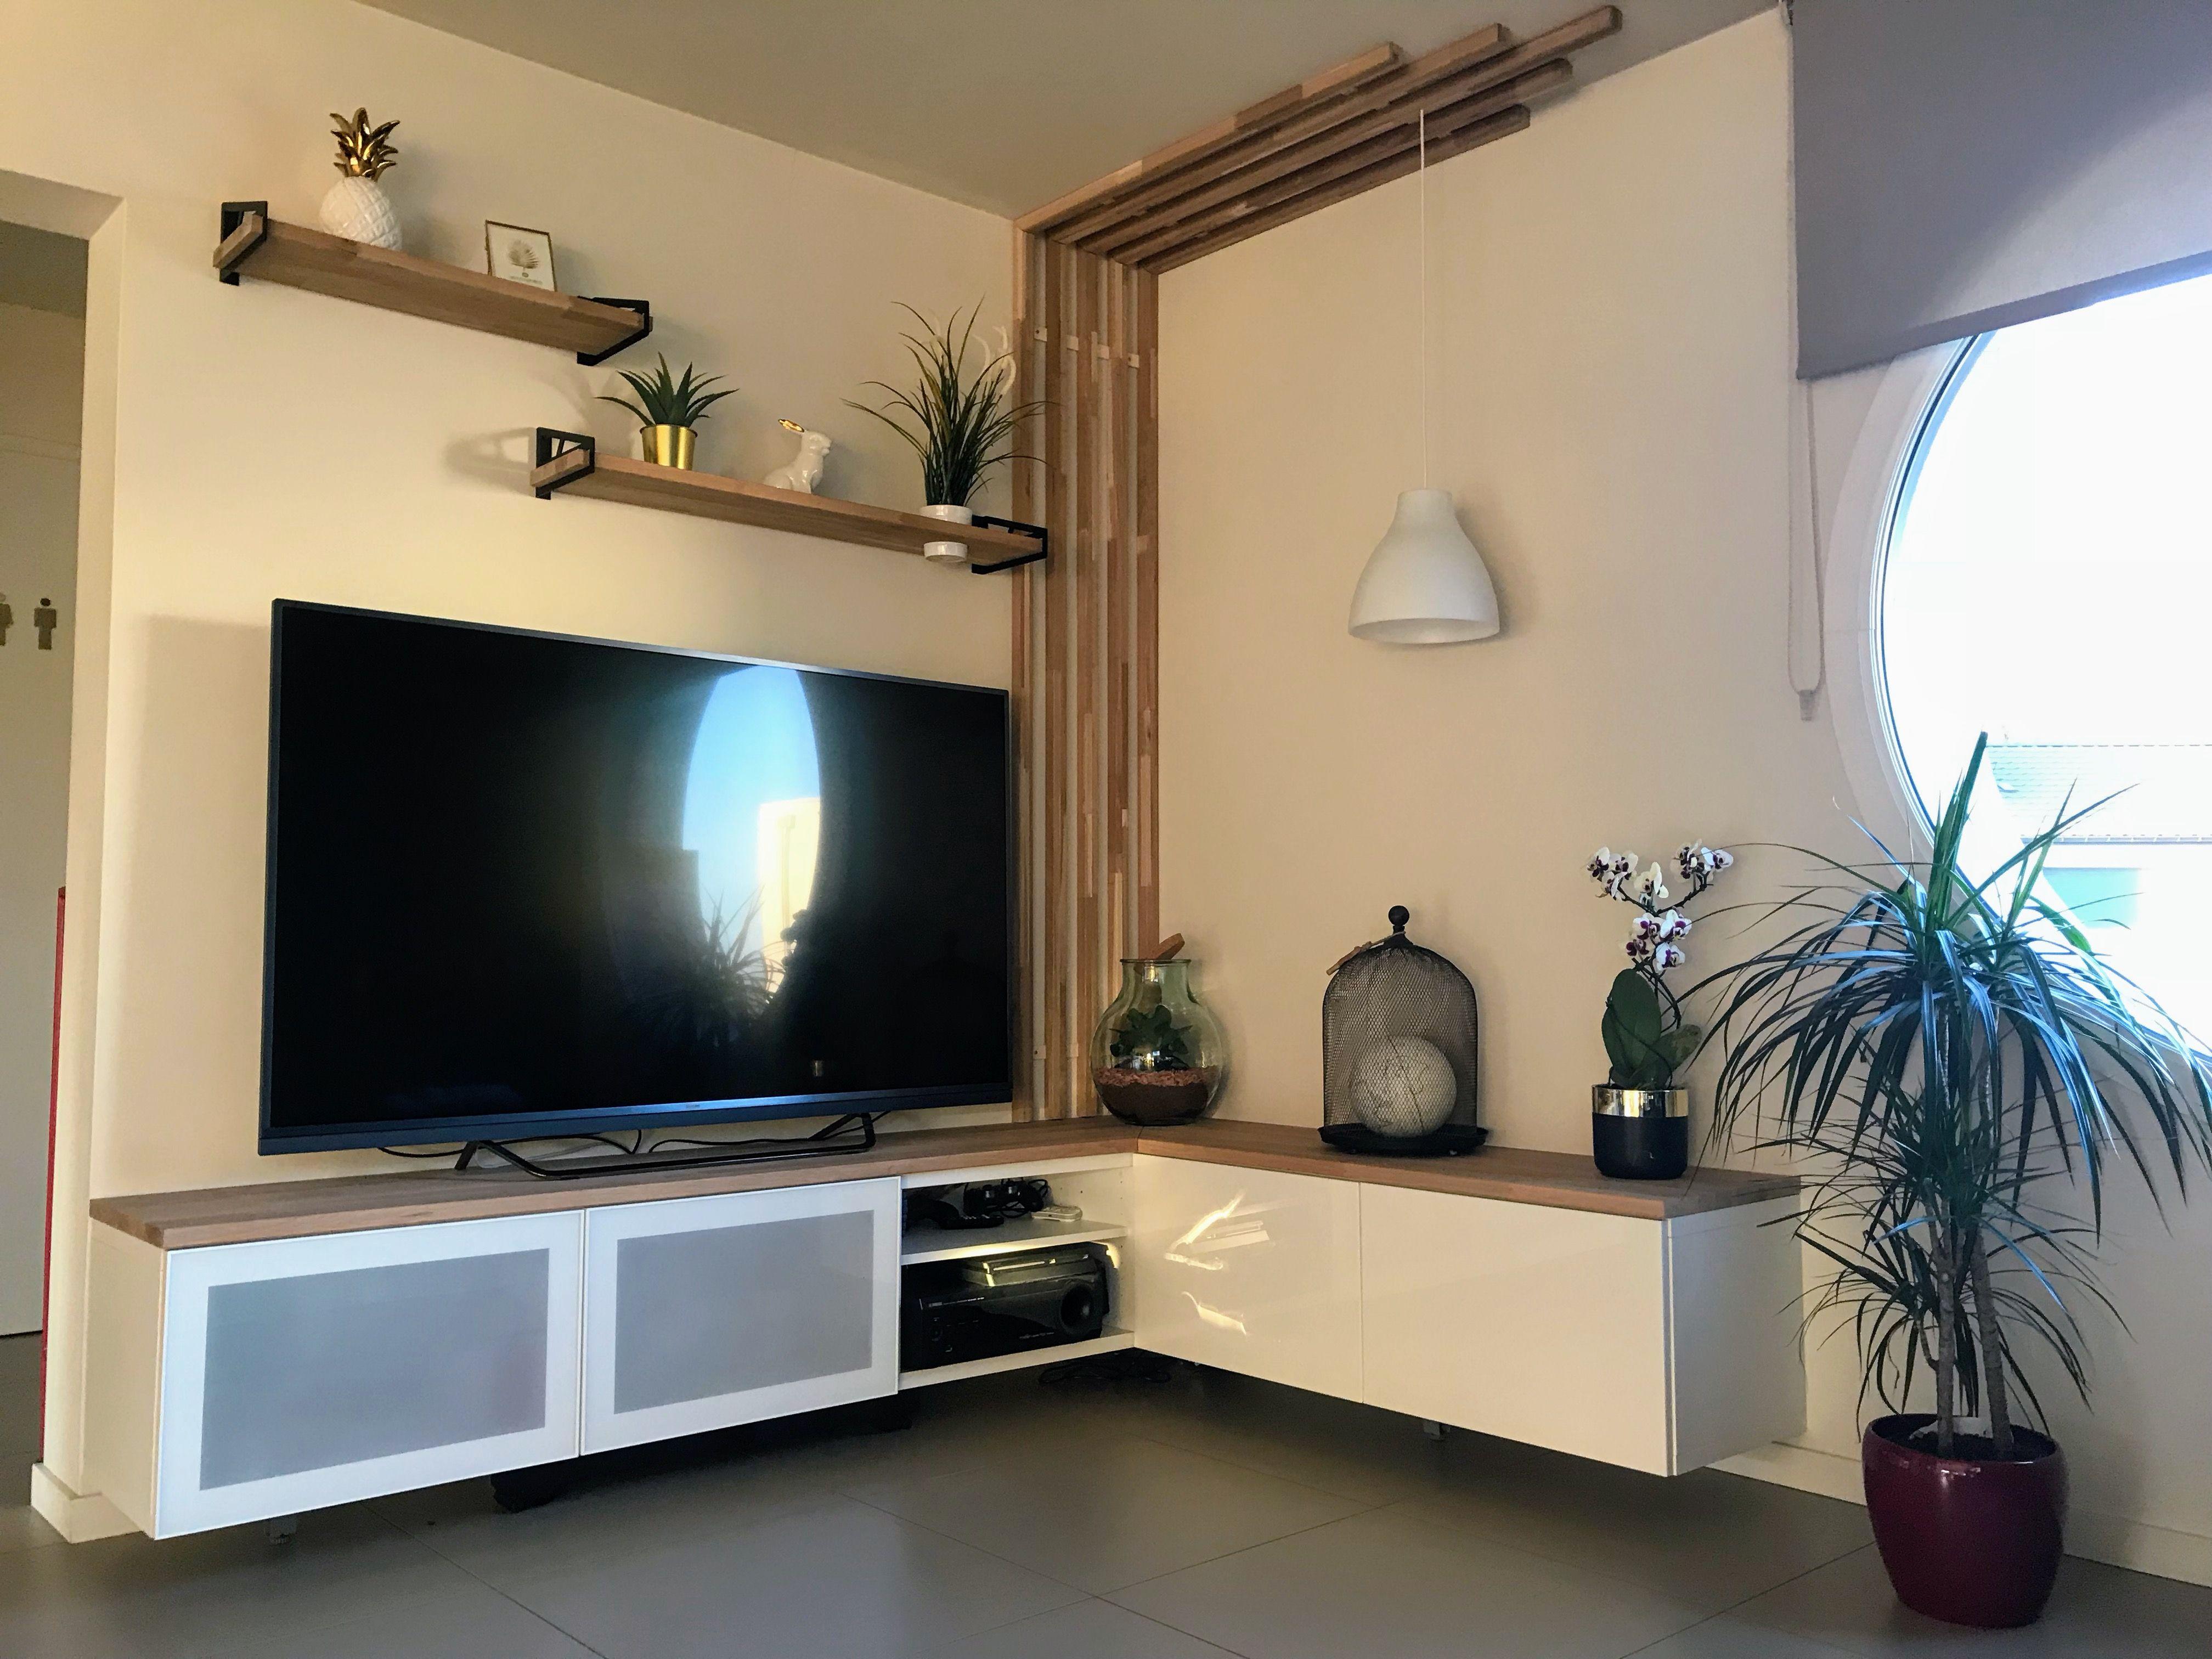 Meuble Tv Ikea Hack Wood Angle Tasseau Ikea Etagere Tv Meuble Deco Salon Wood Design Meuble Salle A Manger Salle A Manger Et Salon Meuble Tv Angle